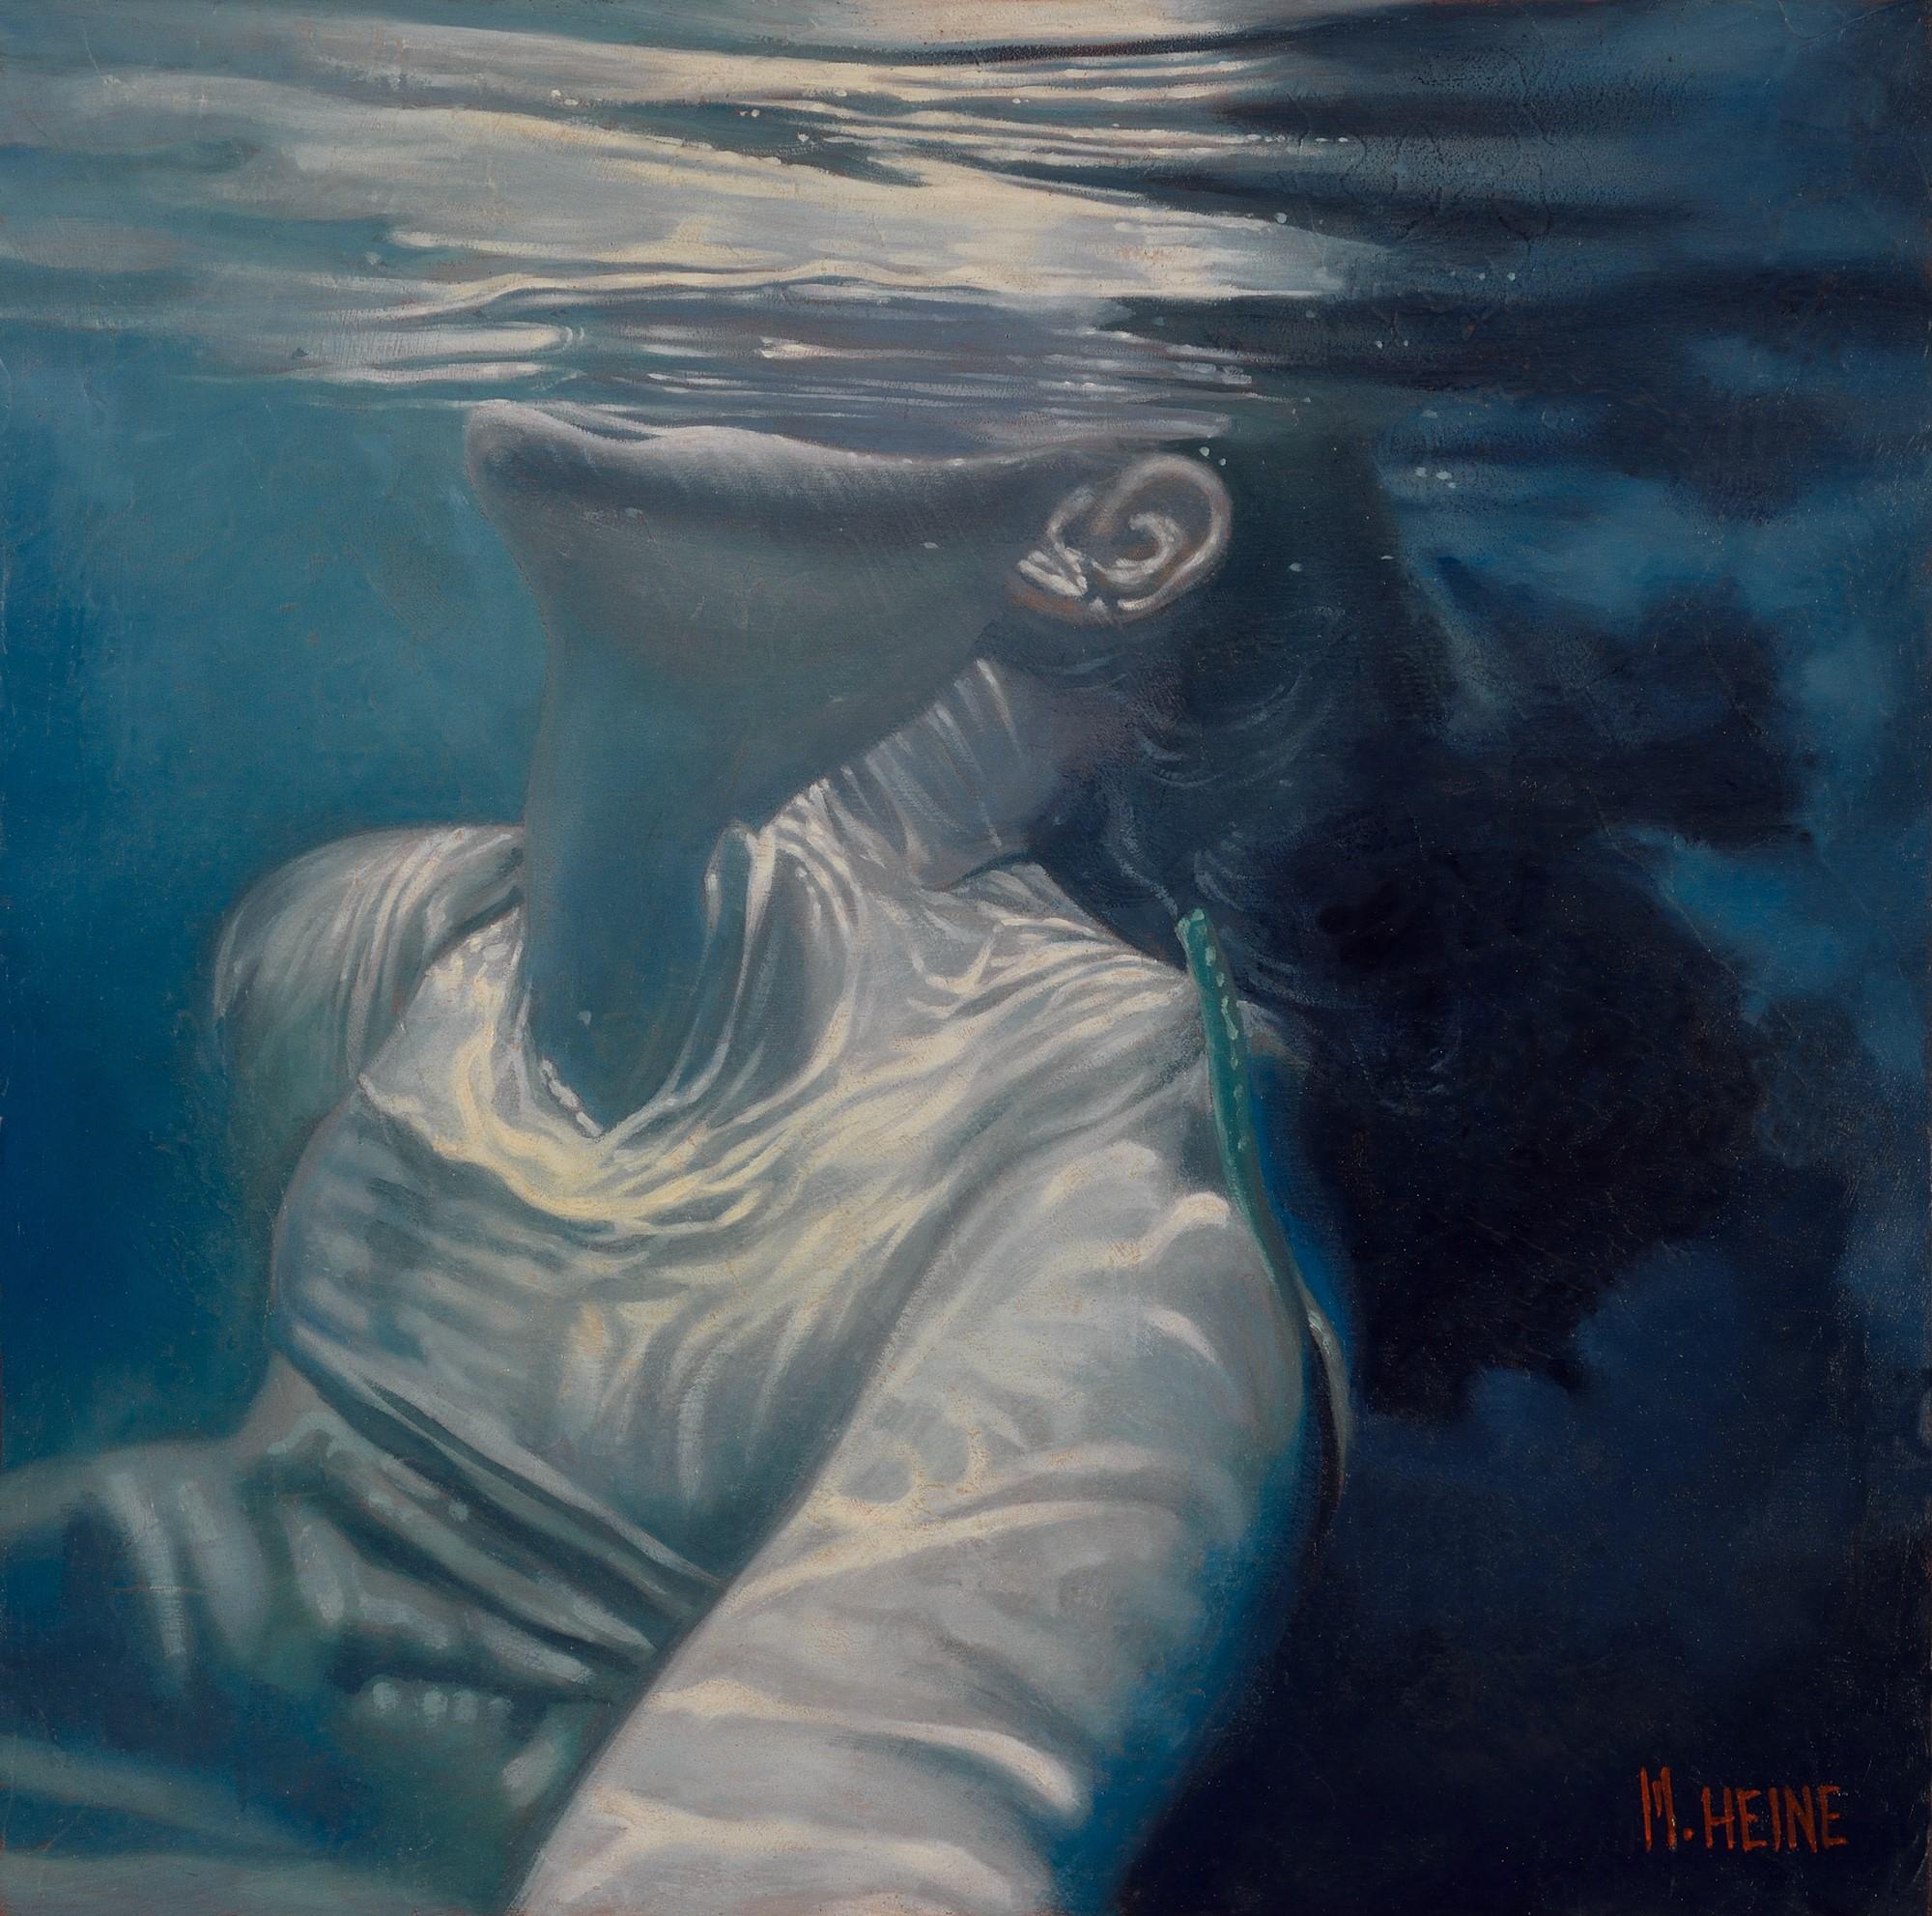 Breath, Study by Mark Heine